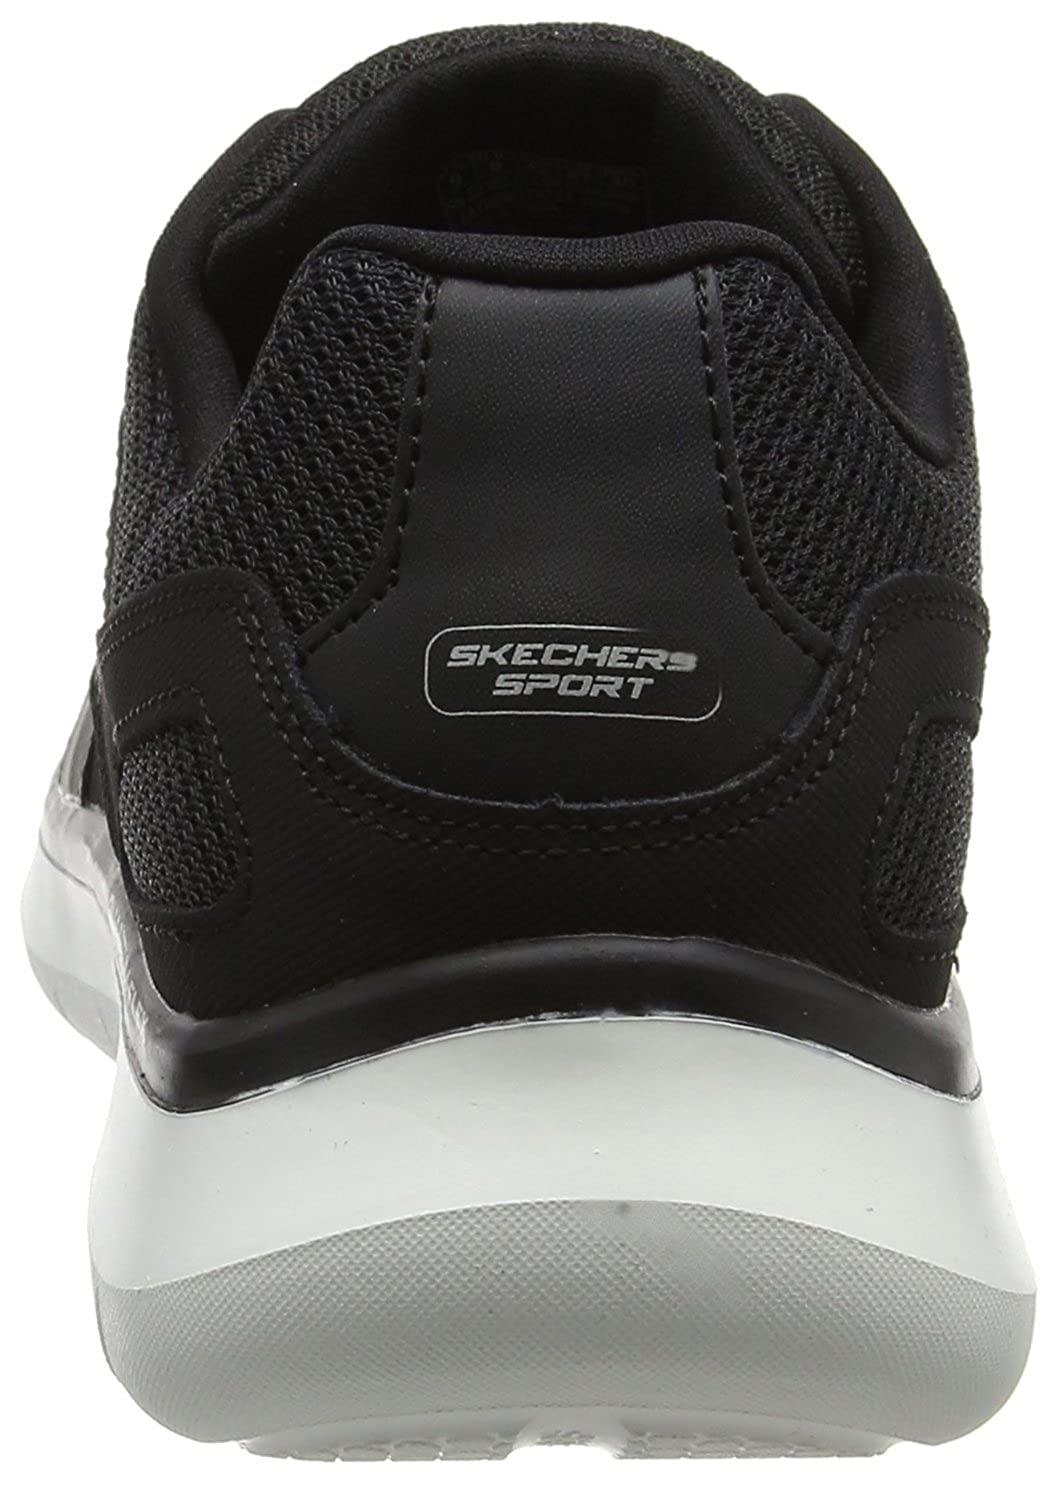 Amazon De Hudzick Flex Skechers Homme Running Chaussures Quantum nwqIHH5E0